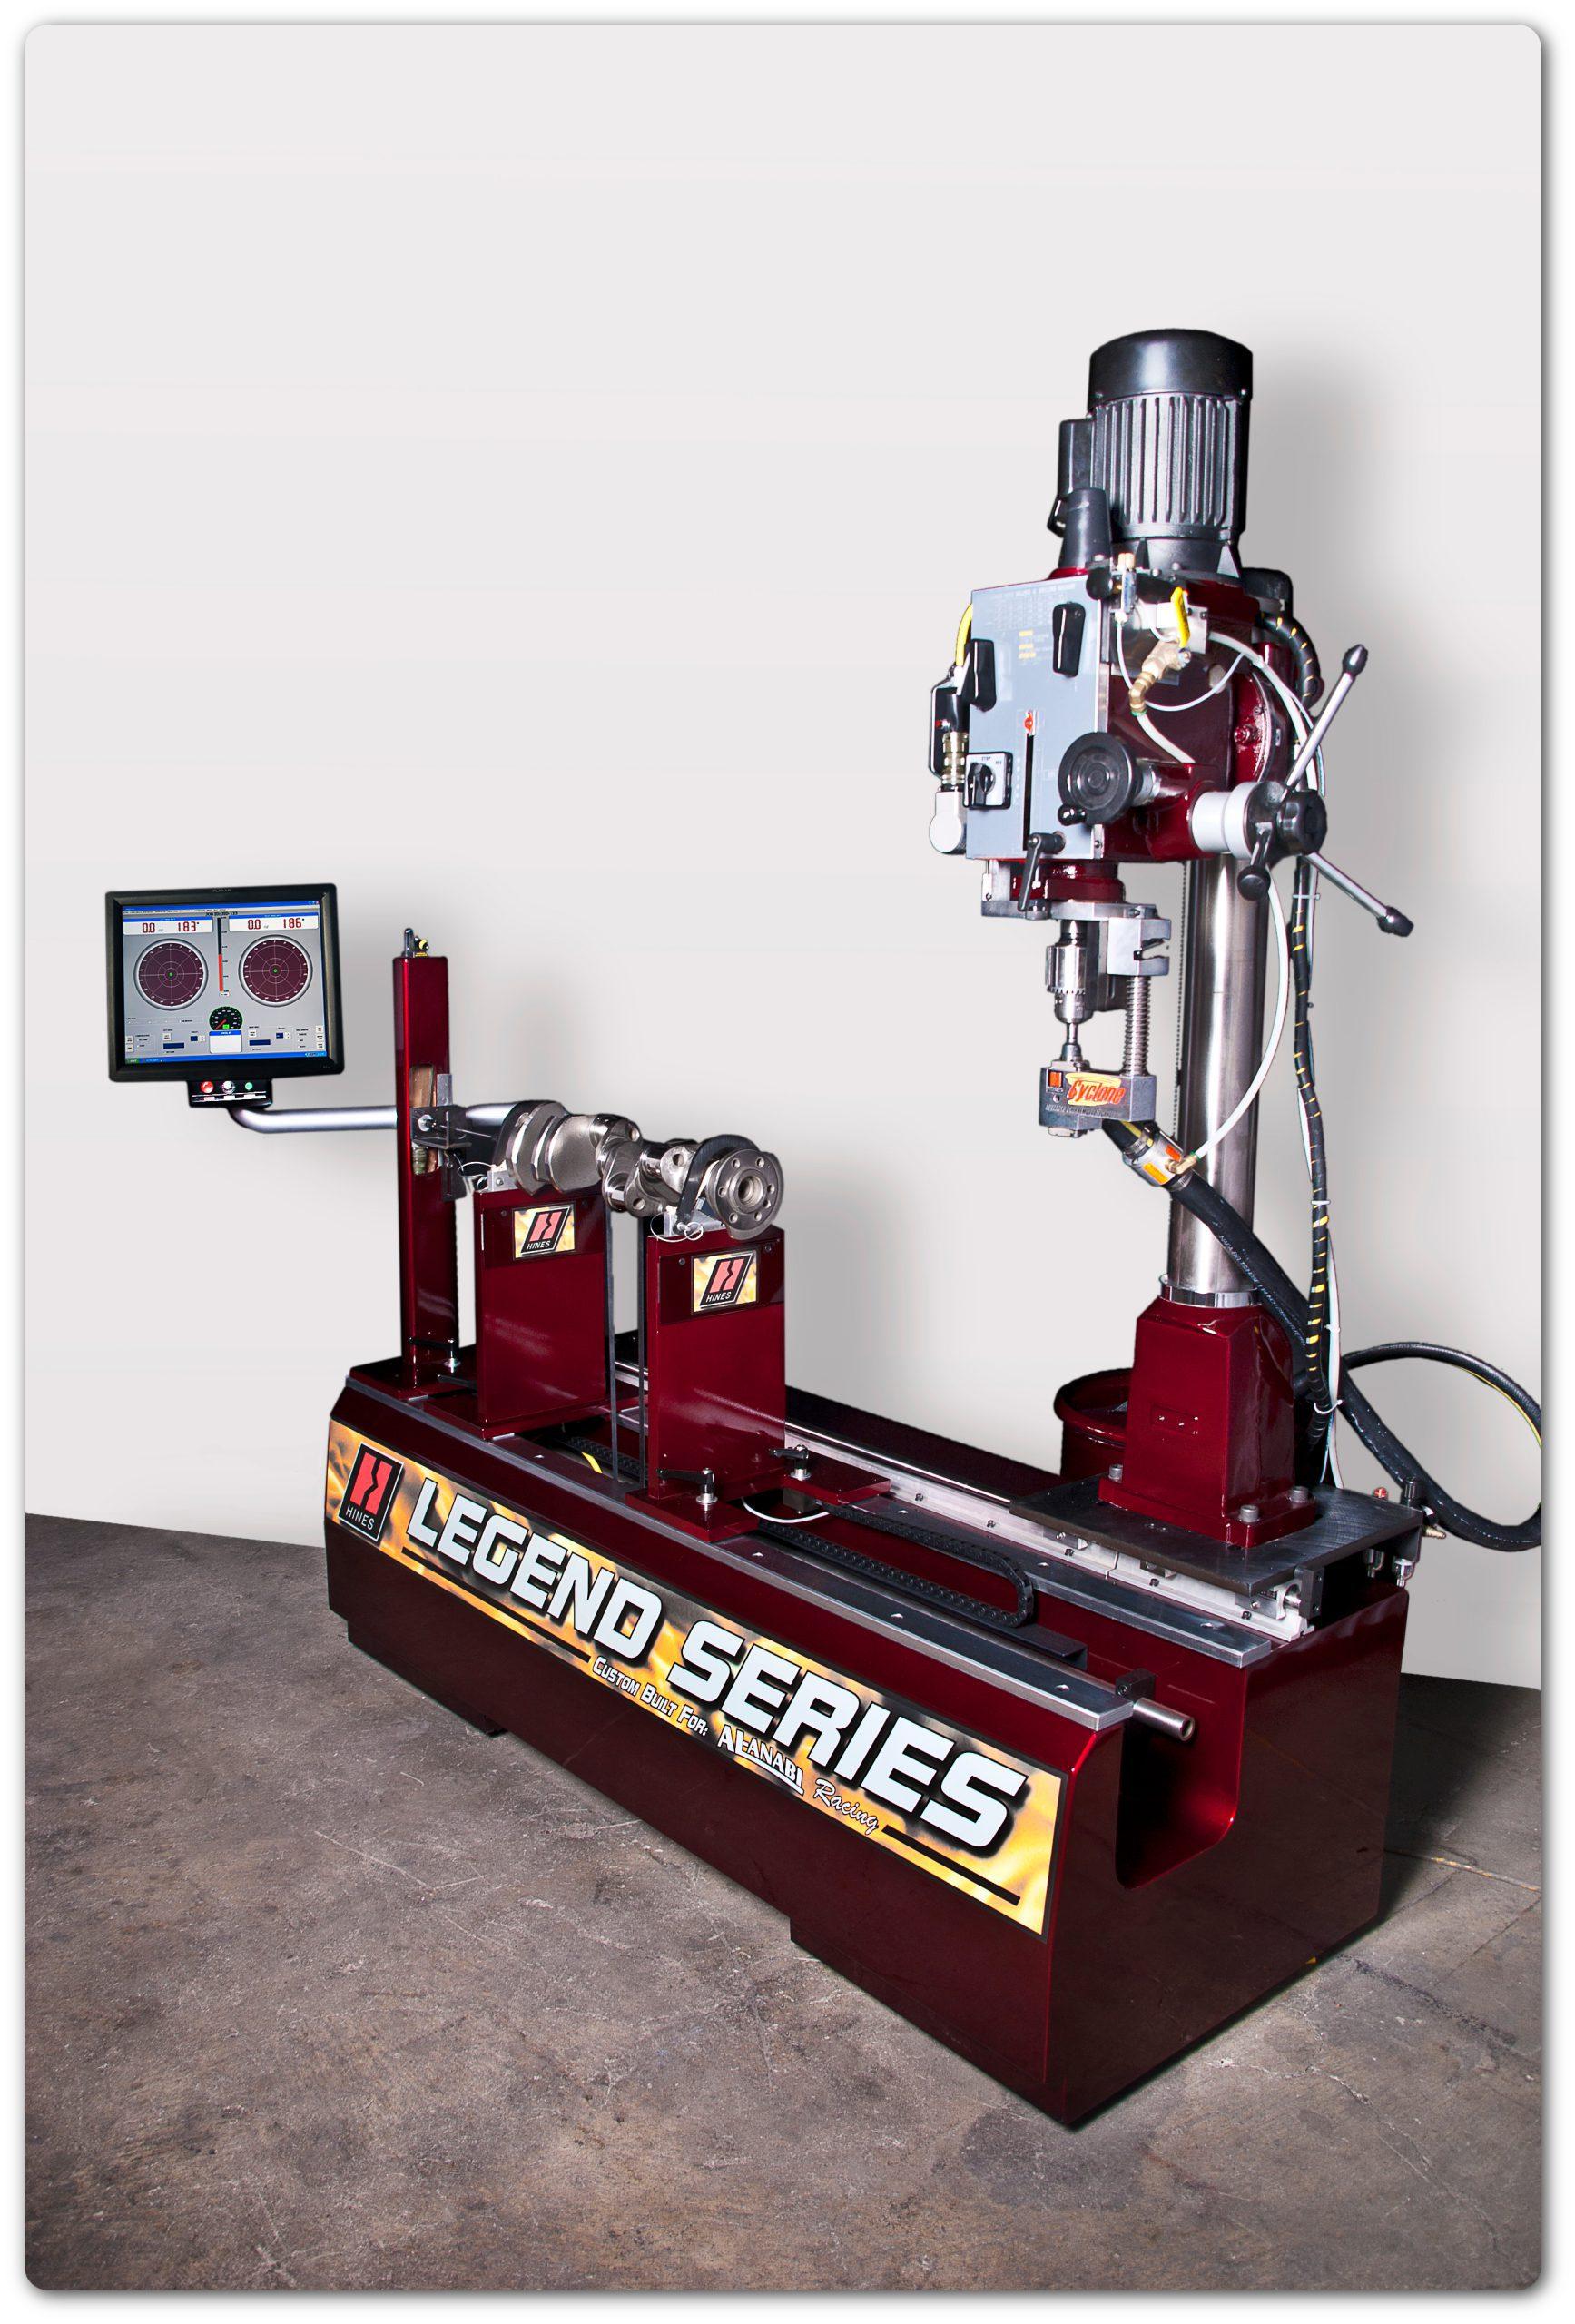 legend series engine balancer